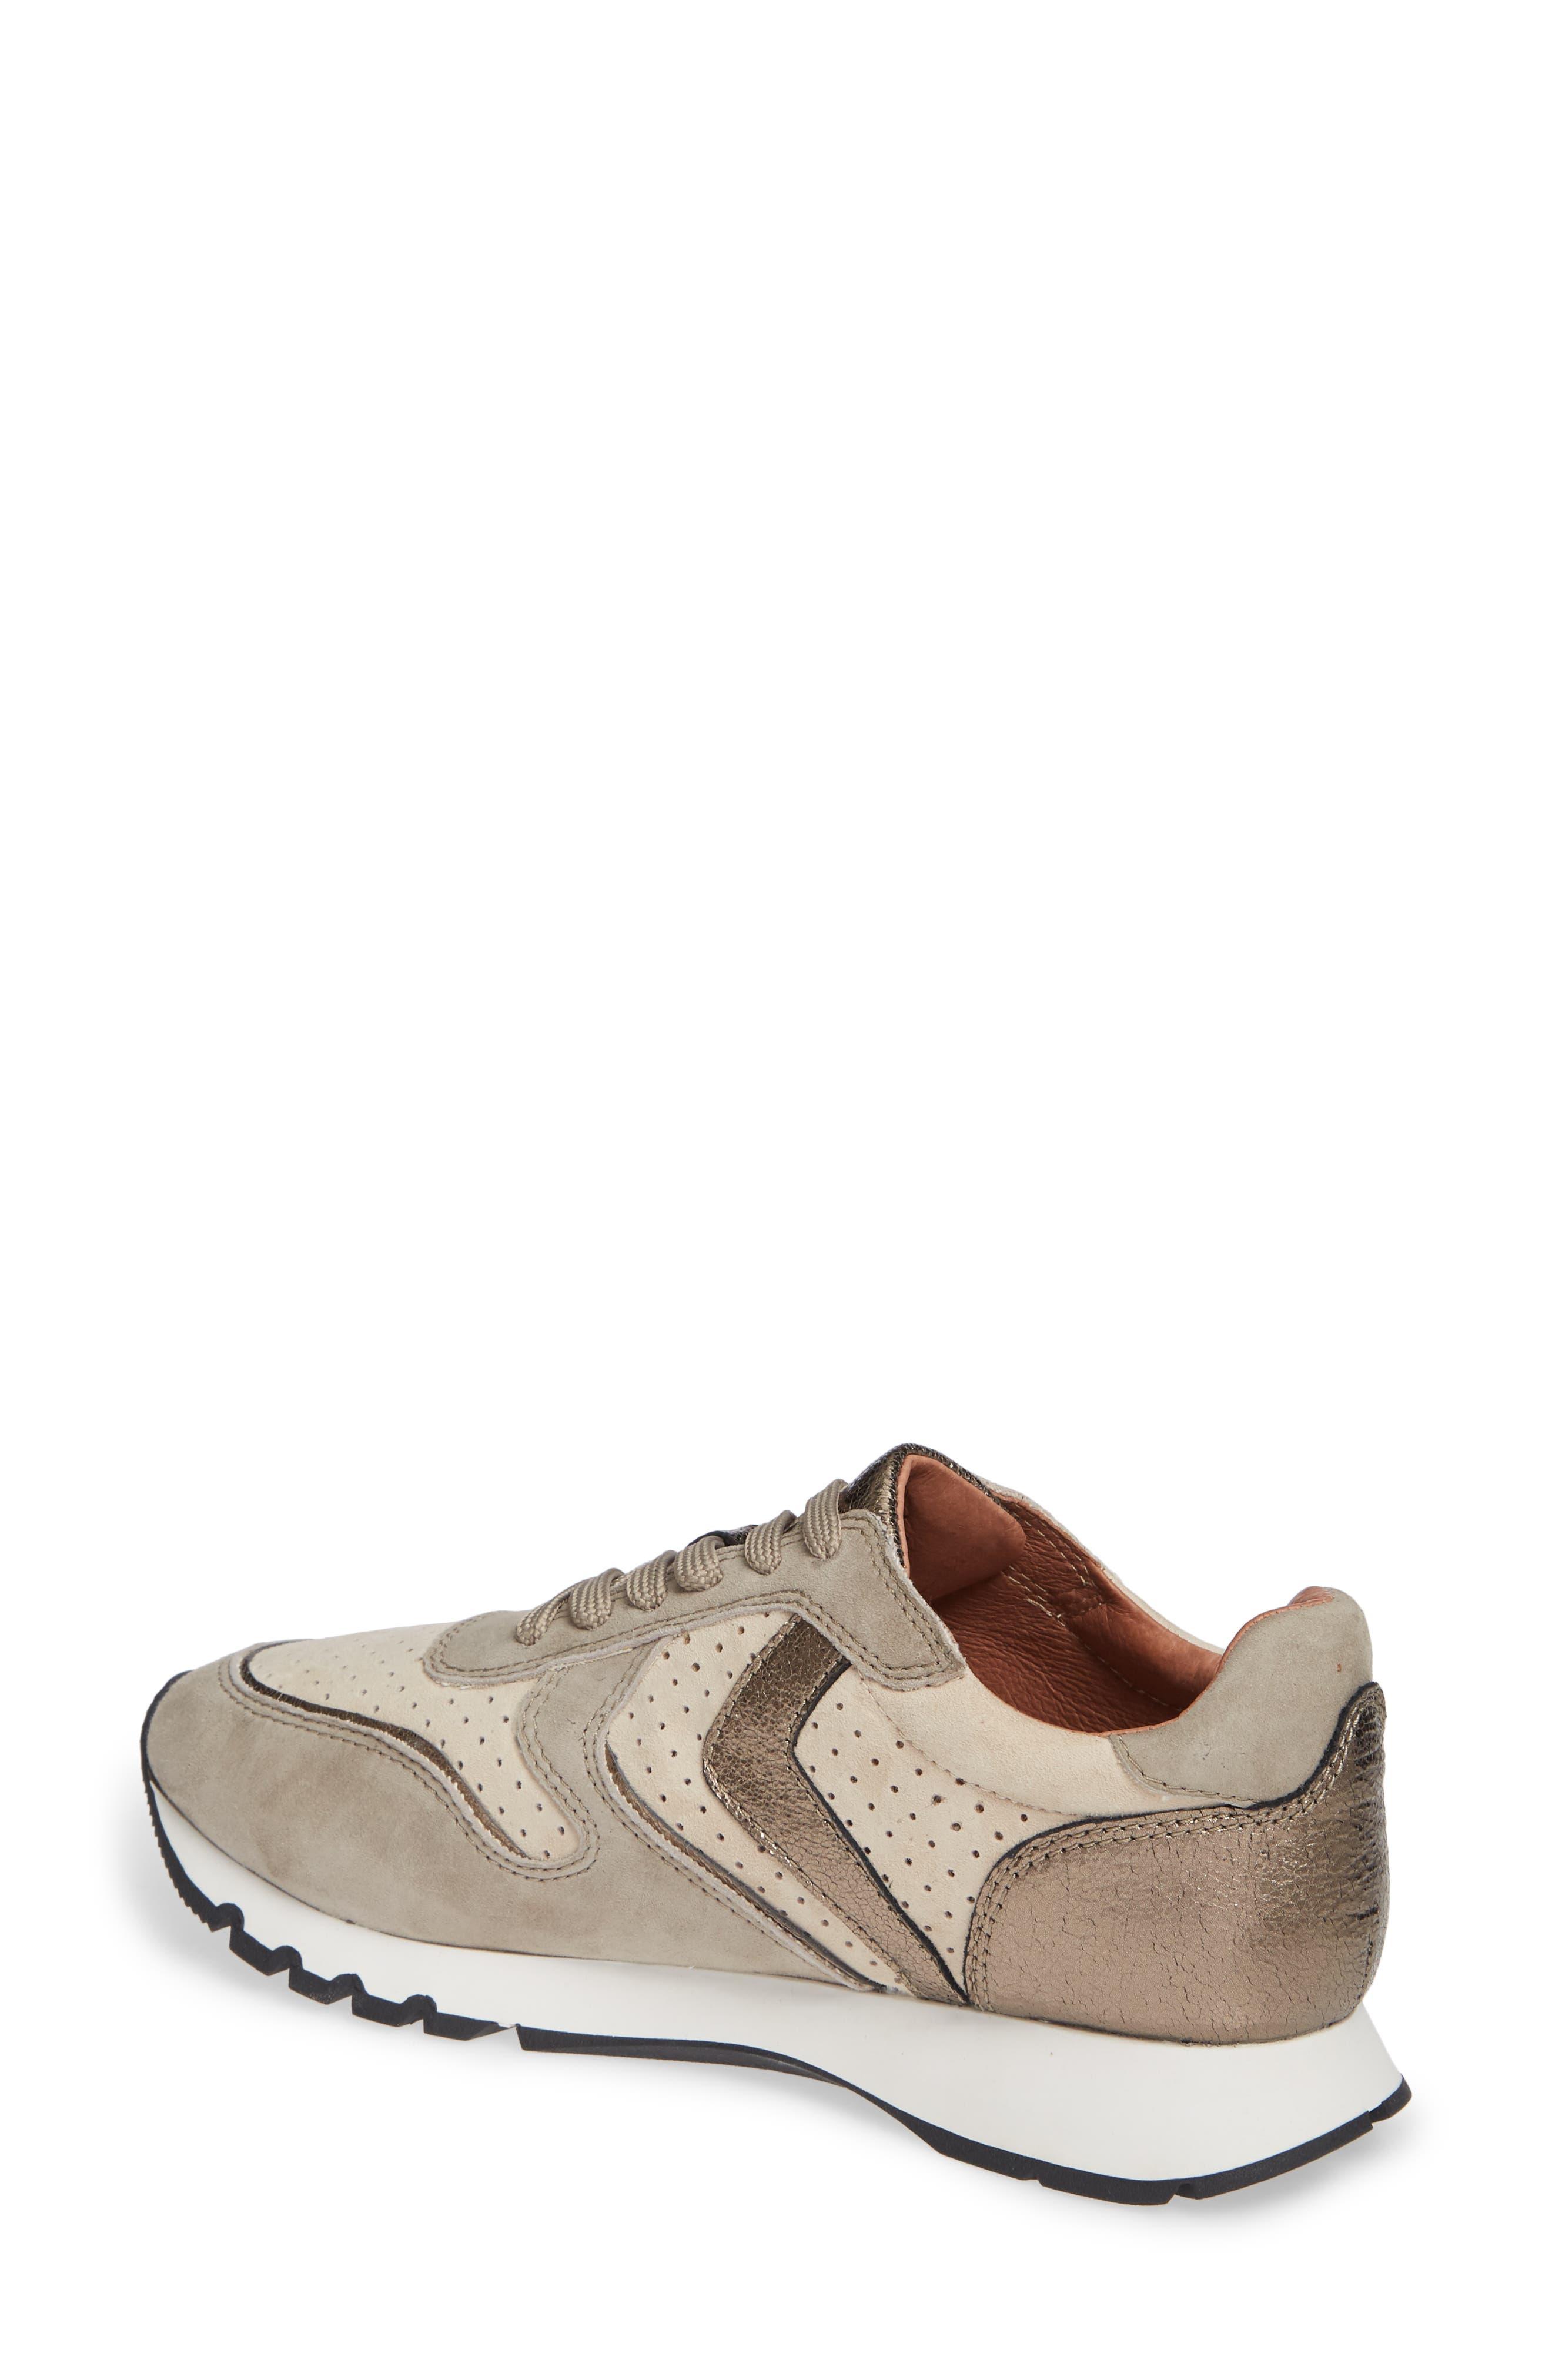 c5fd19496e0 Caslon® Women s Sneakers Clothing